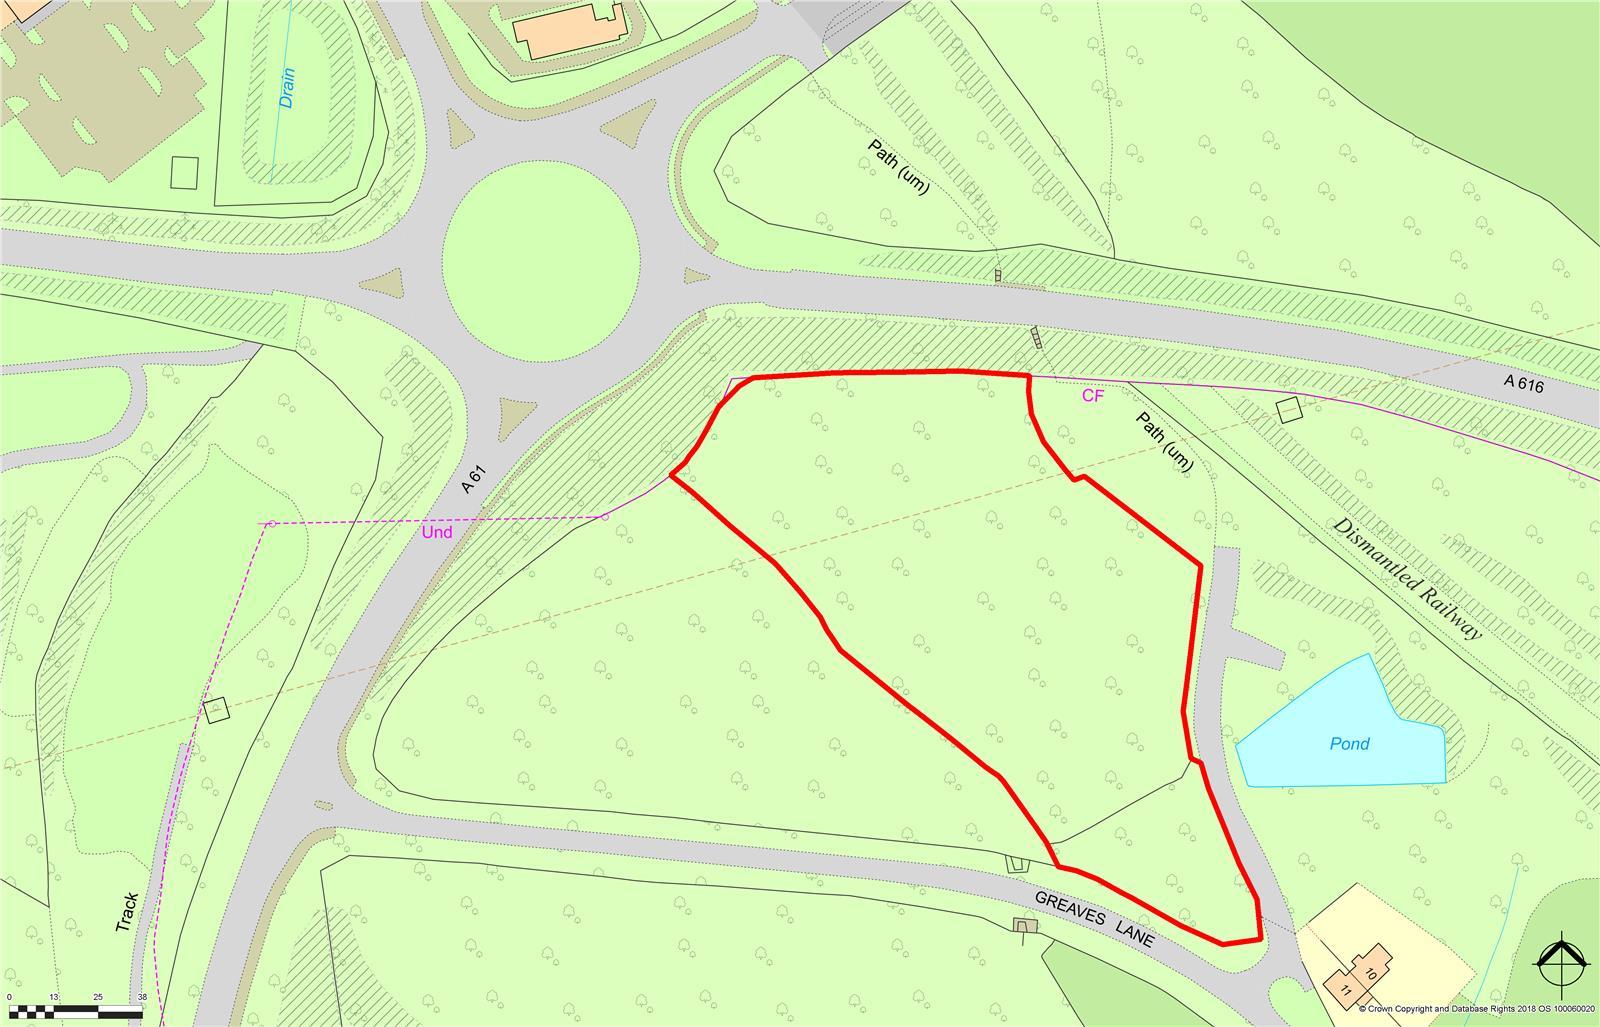 Greaves Lane, Tankersley, Sheffield, South Yorkshire, S35 4GR